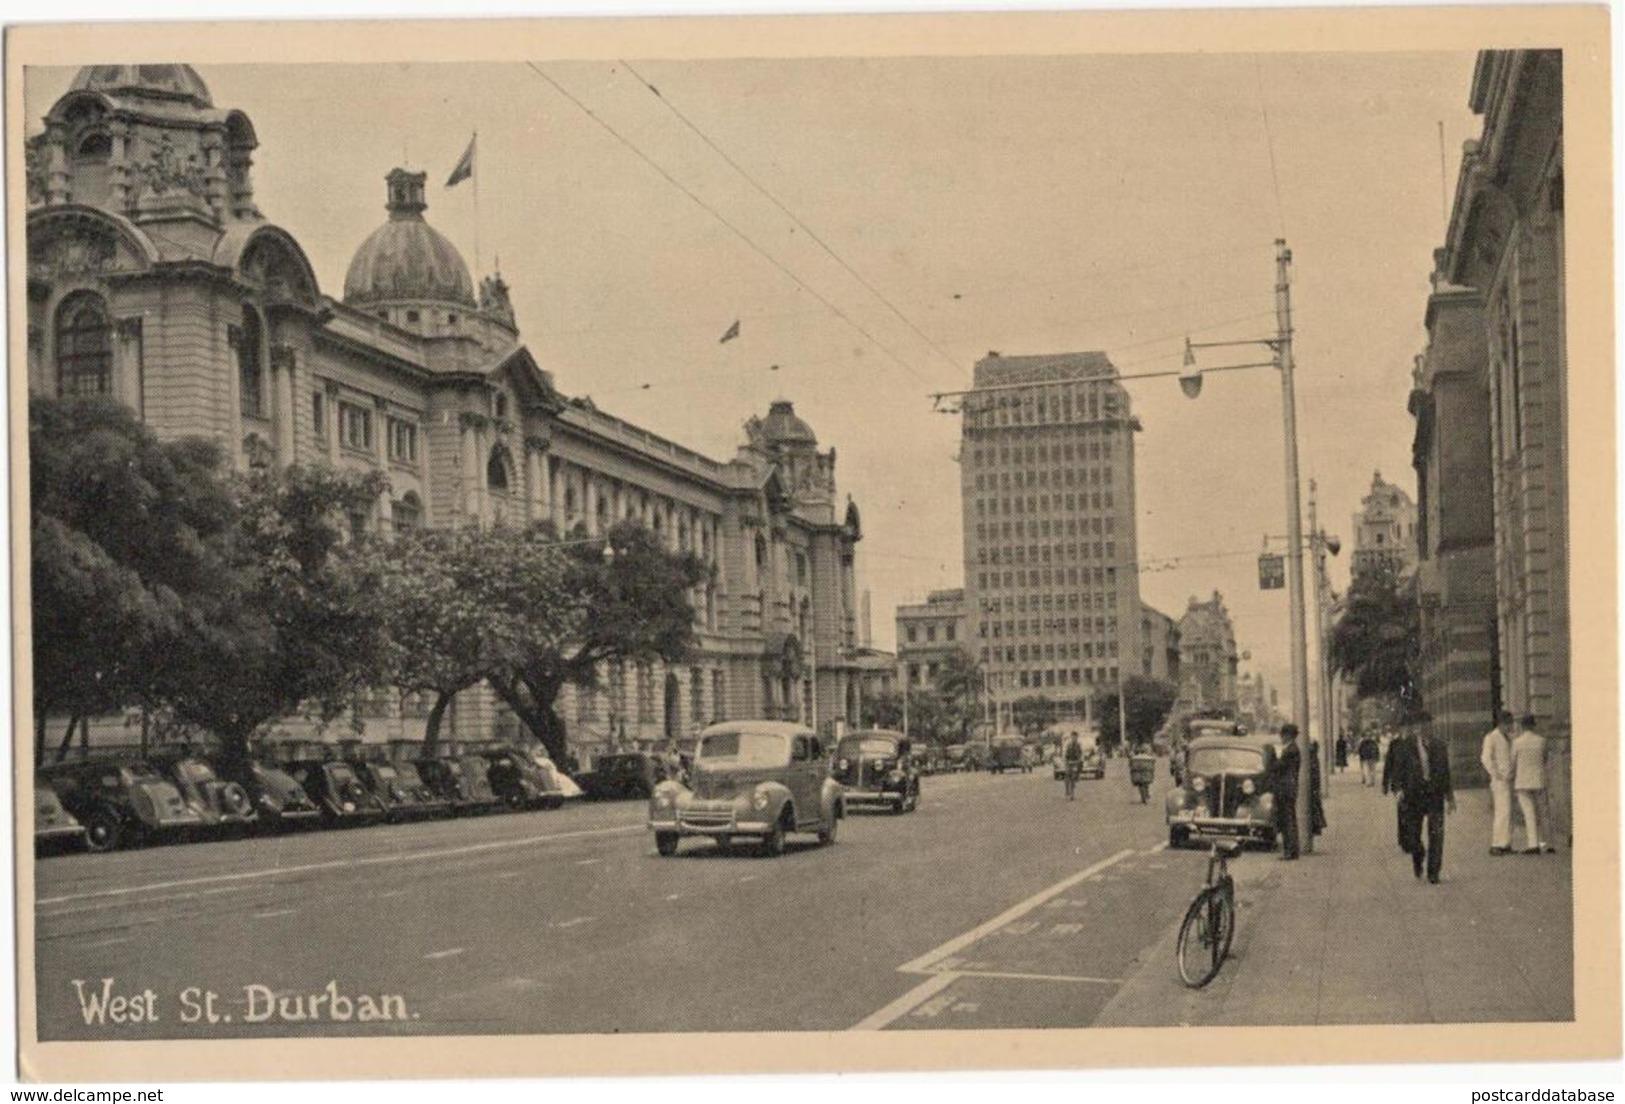 West St. Durban - & Old Cars - Zuid-Afrika